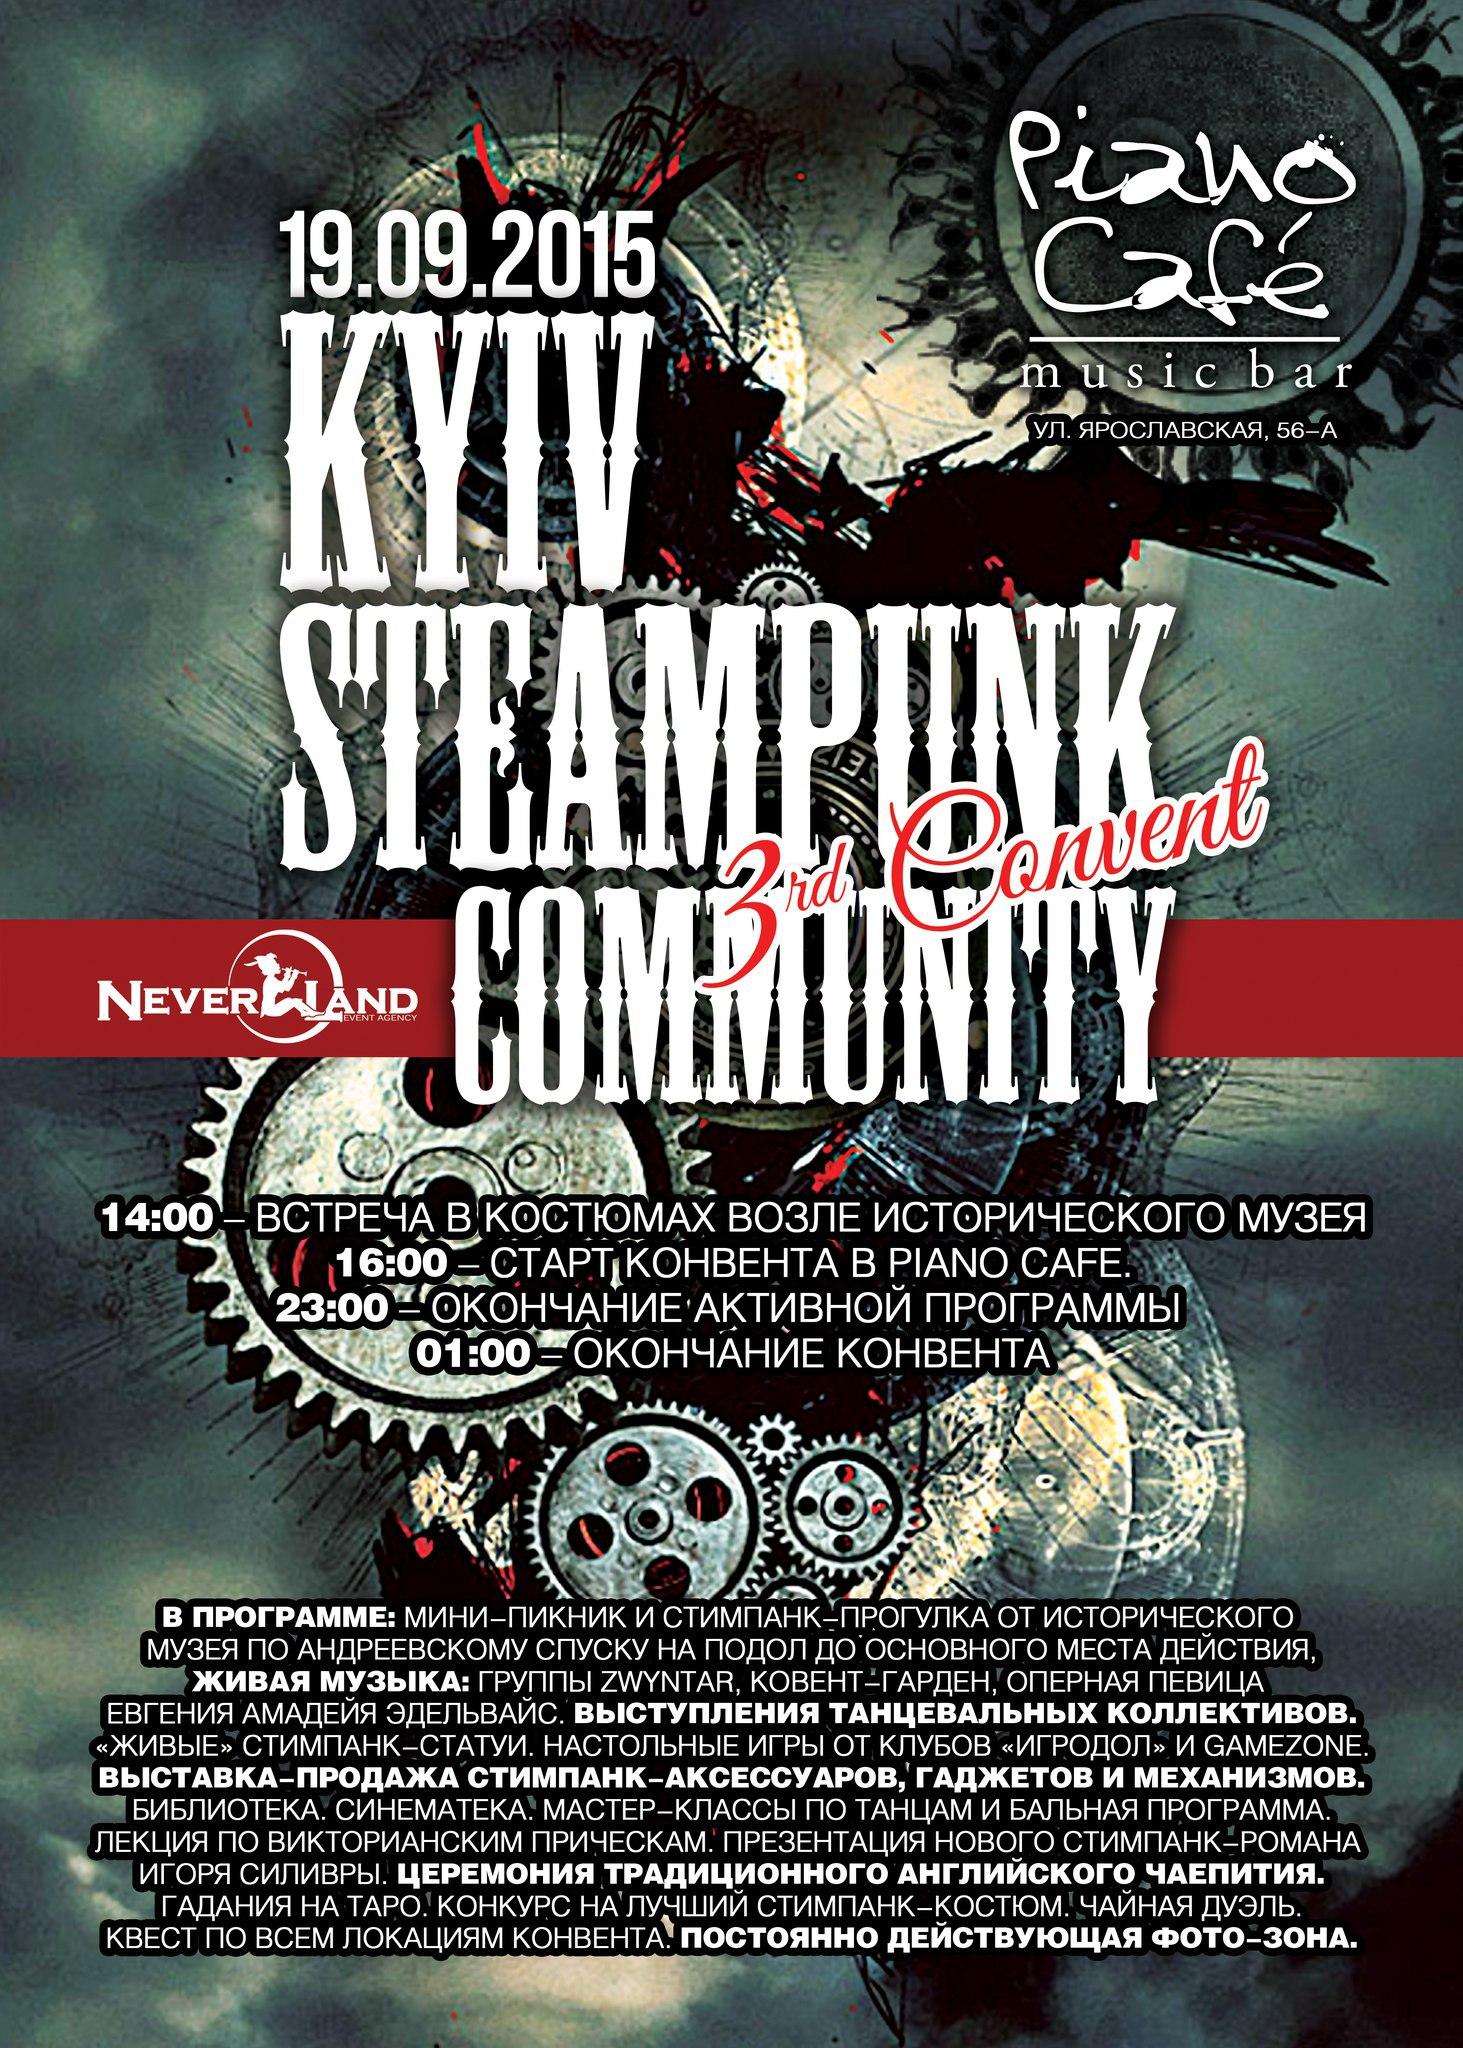 Kiev Steampunk Convent 19.09.2015